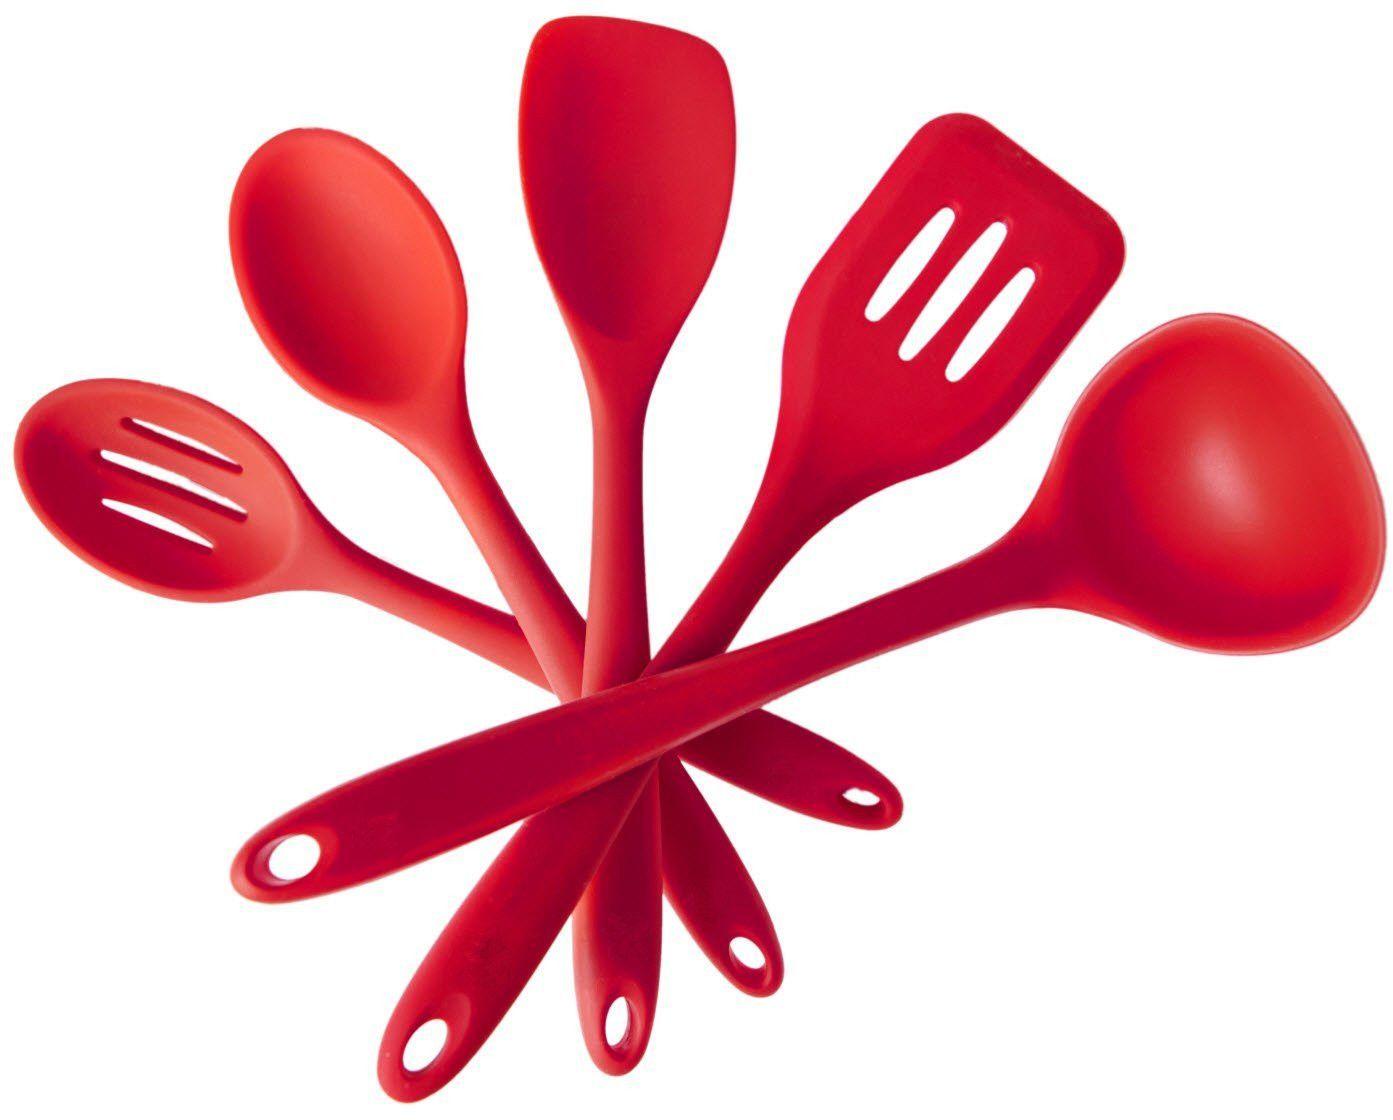 5 Pcs Silicone Kitchen Cooking Utensil Spatulas, Spoons U0026 Turner  Heat  Resistant Baking Utensils